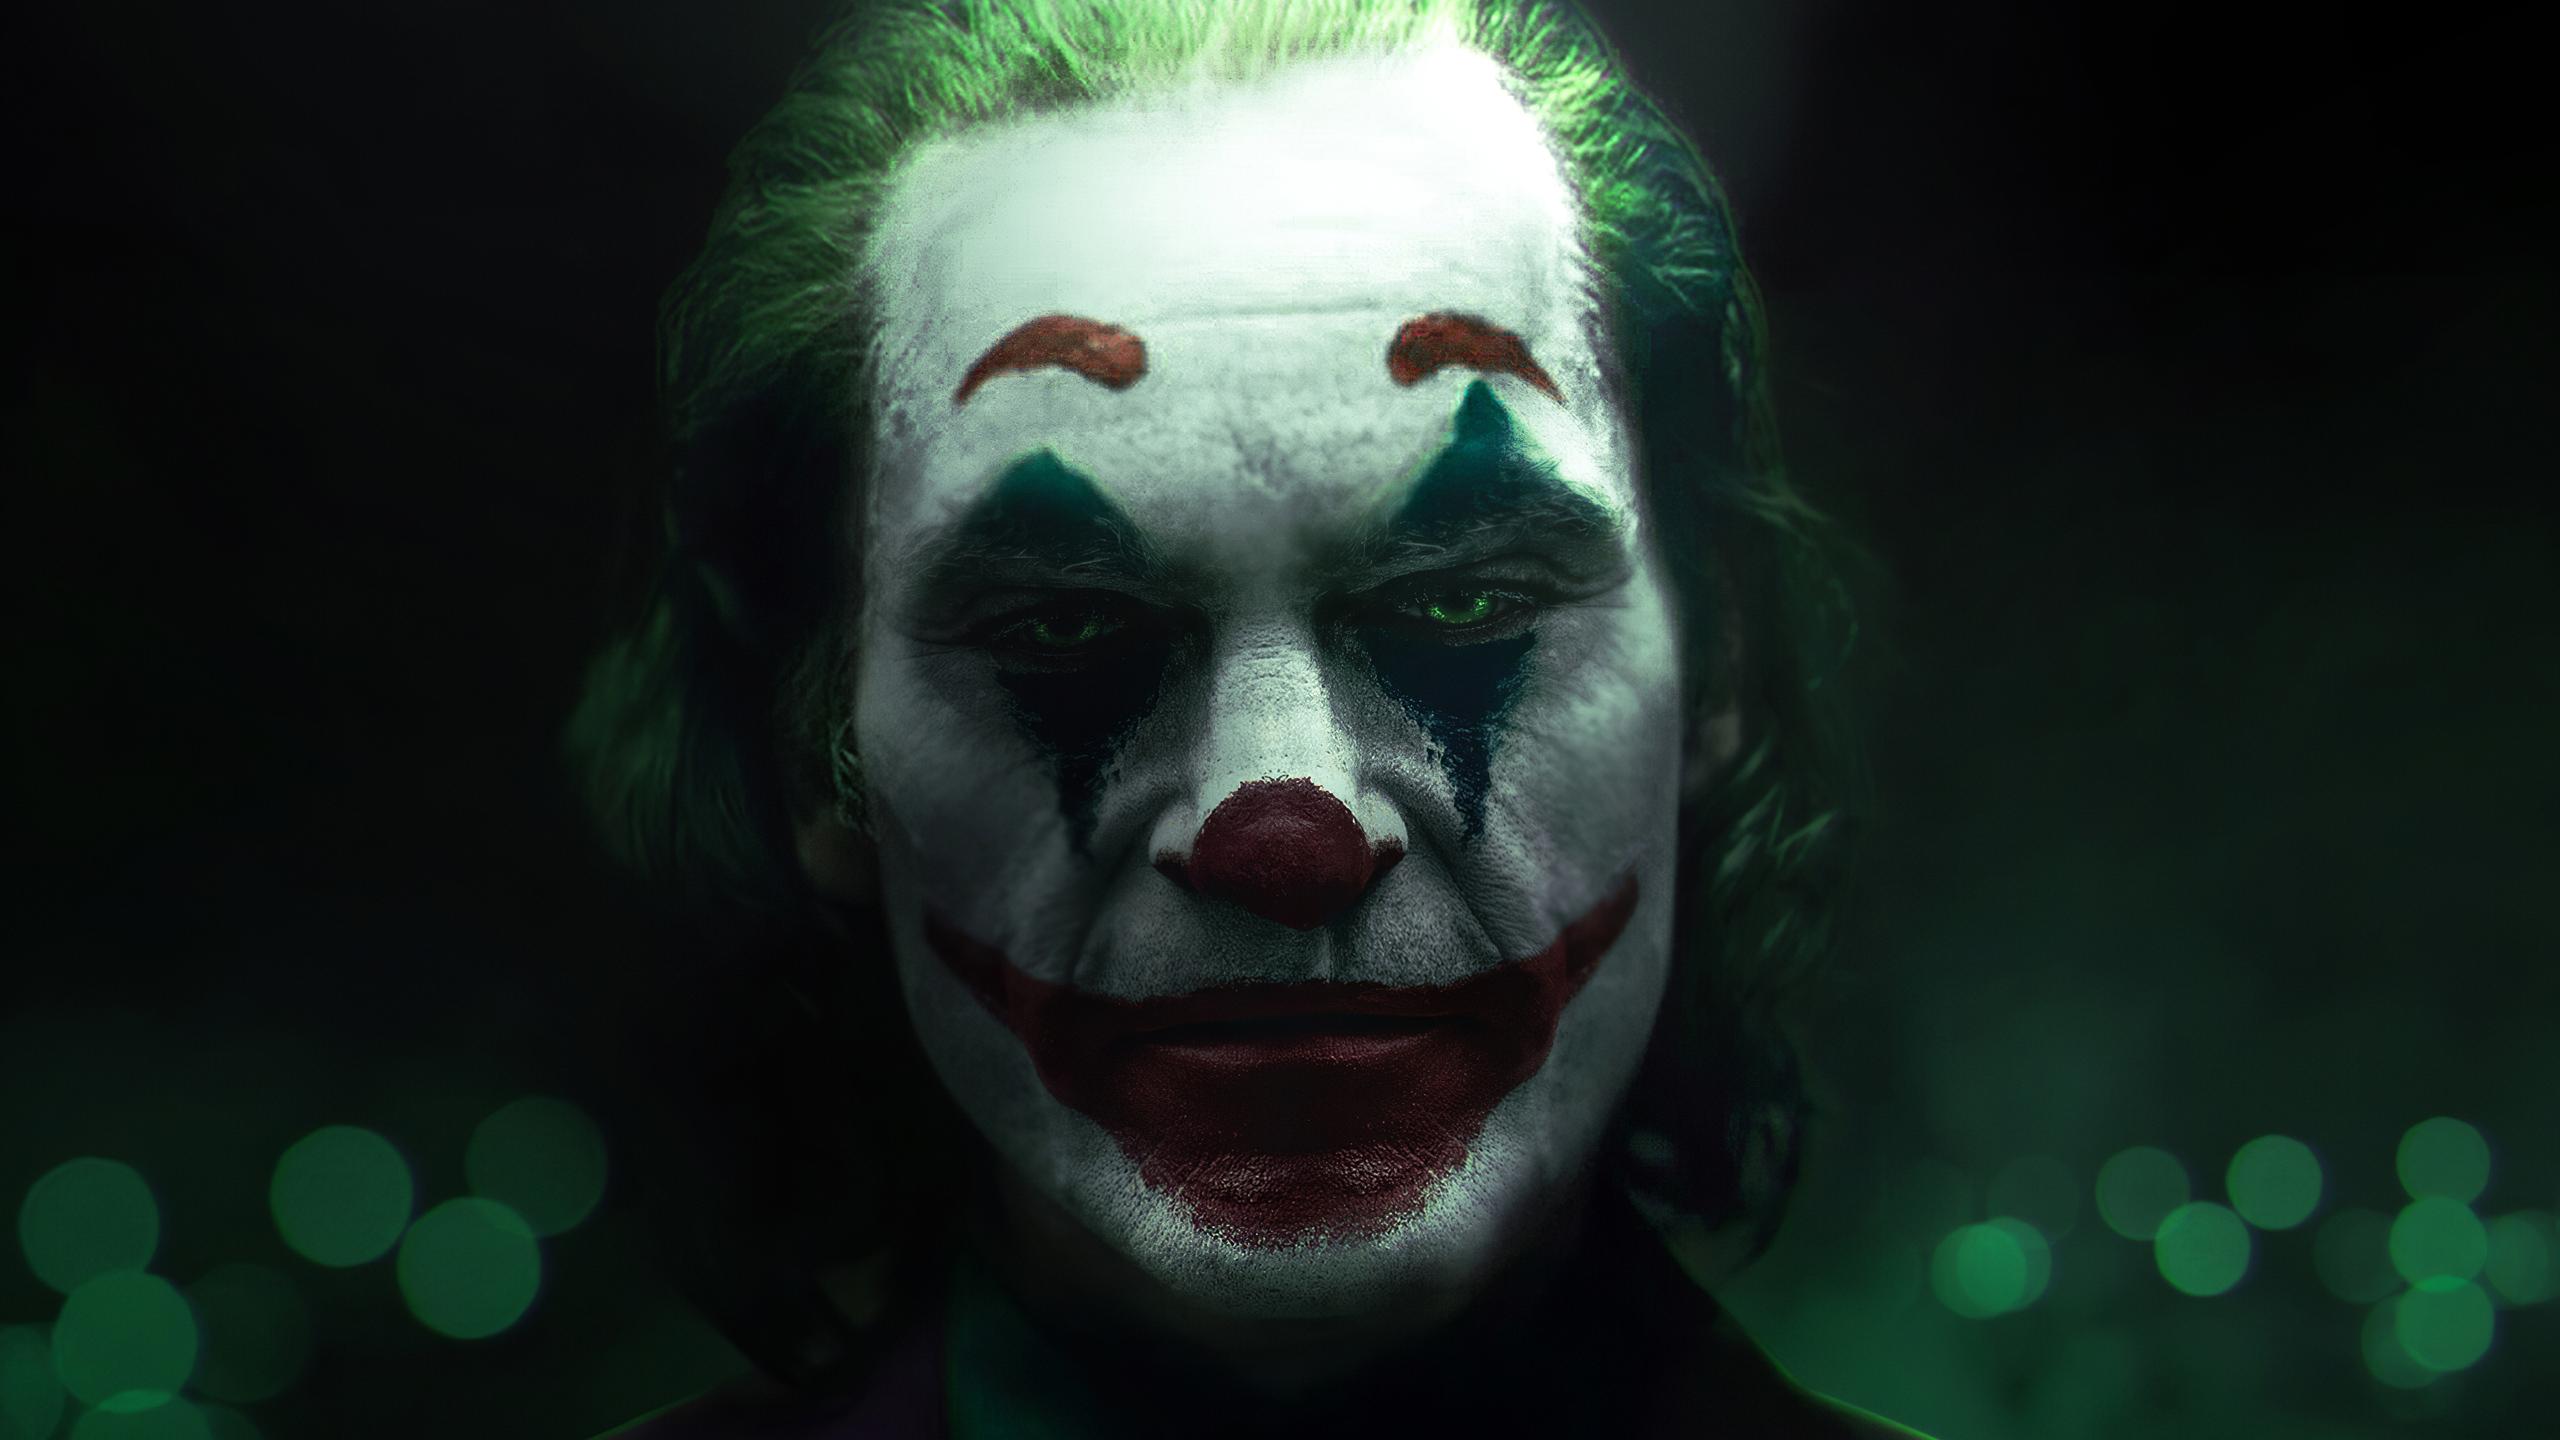 2560x1440 4k Joker 2020 1440P Resolution HD 4k Wallpapers ...